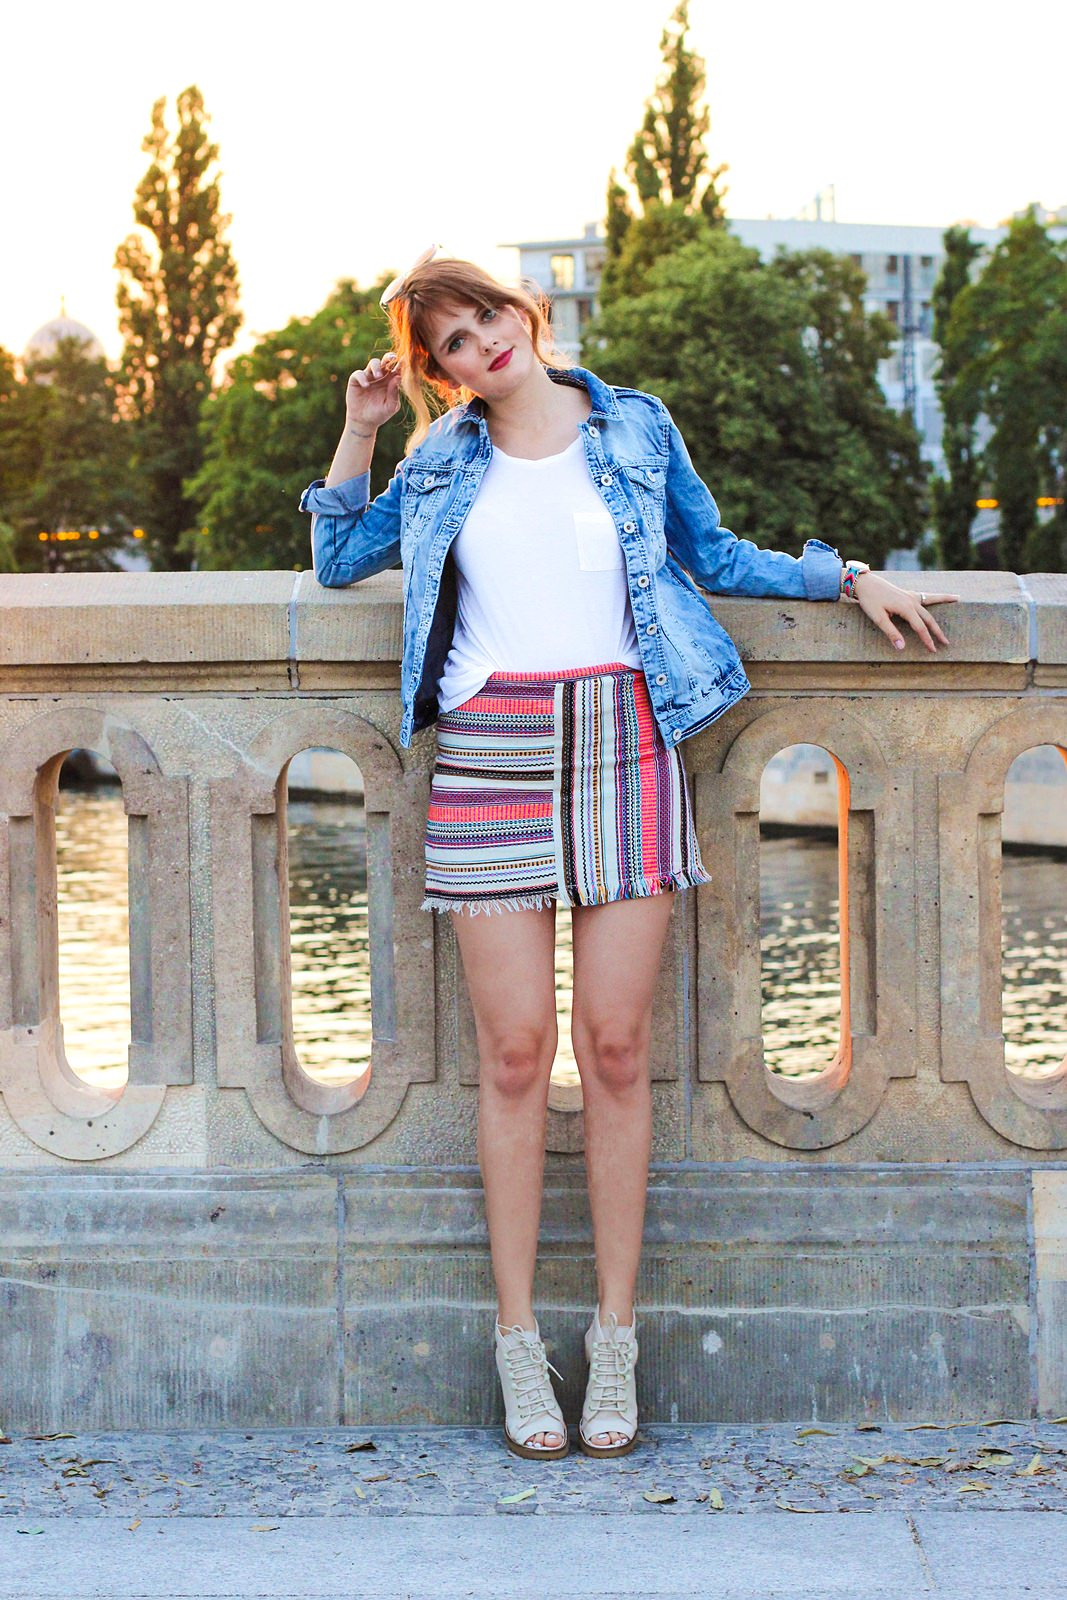 desbelleschoses-jeansjacke-runde-sonnenbrille-weißes-tshirt-sommer-berlin-museumsmeile 5